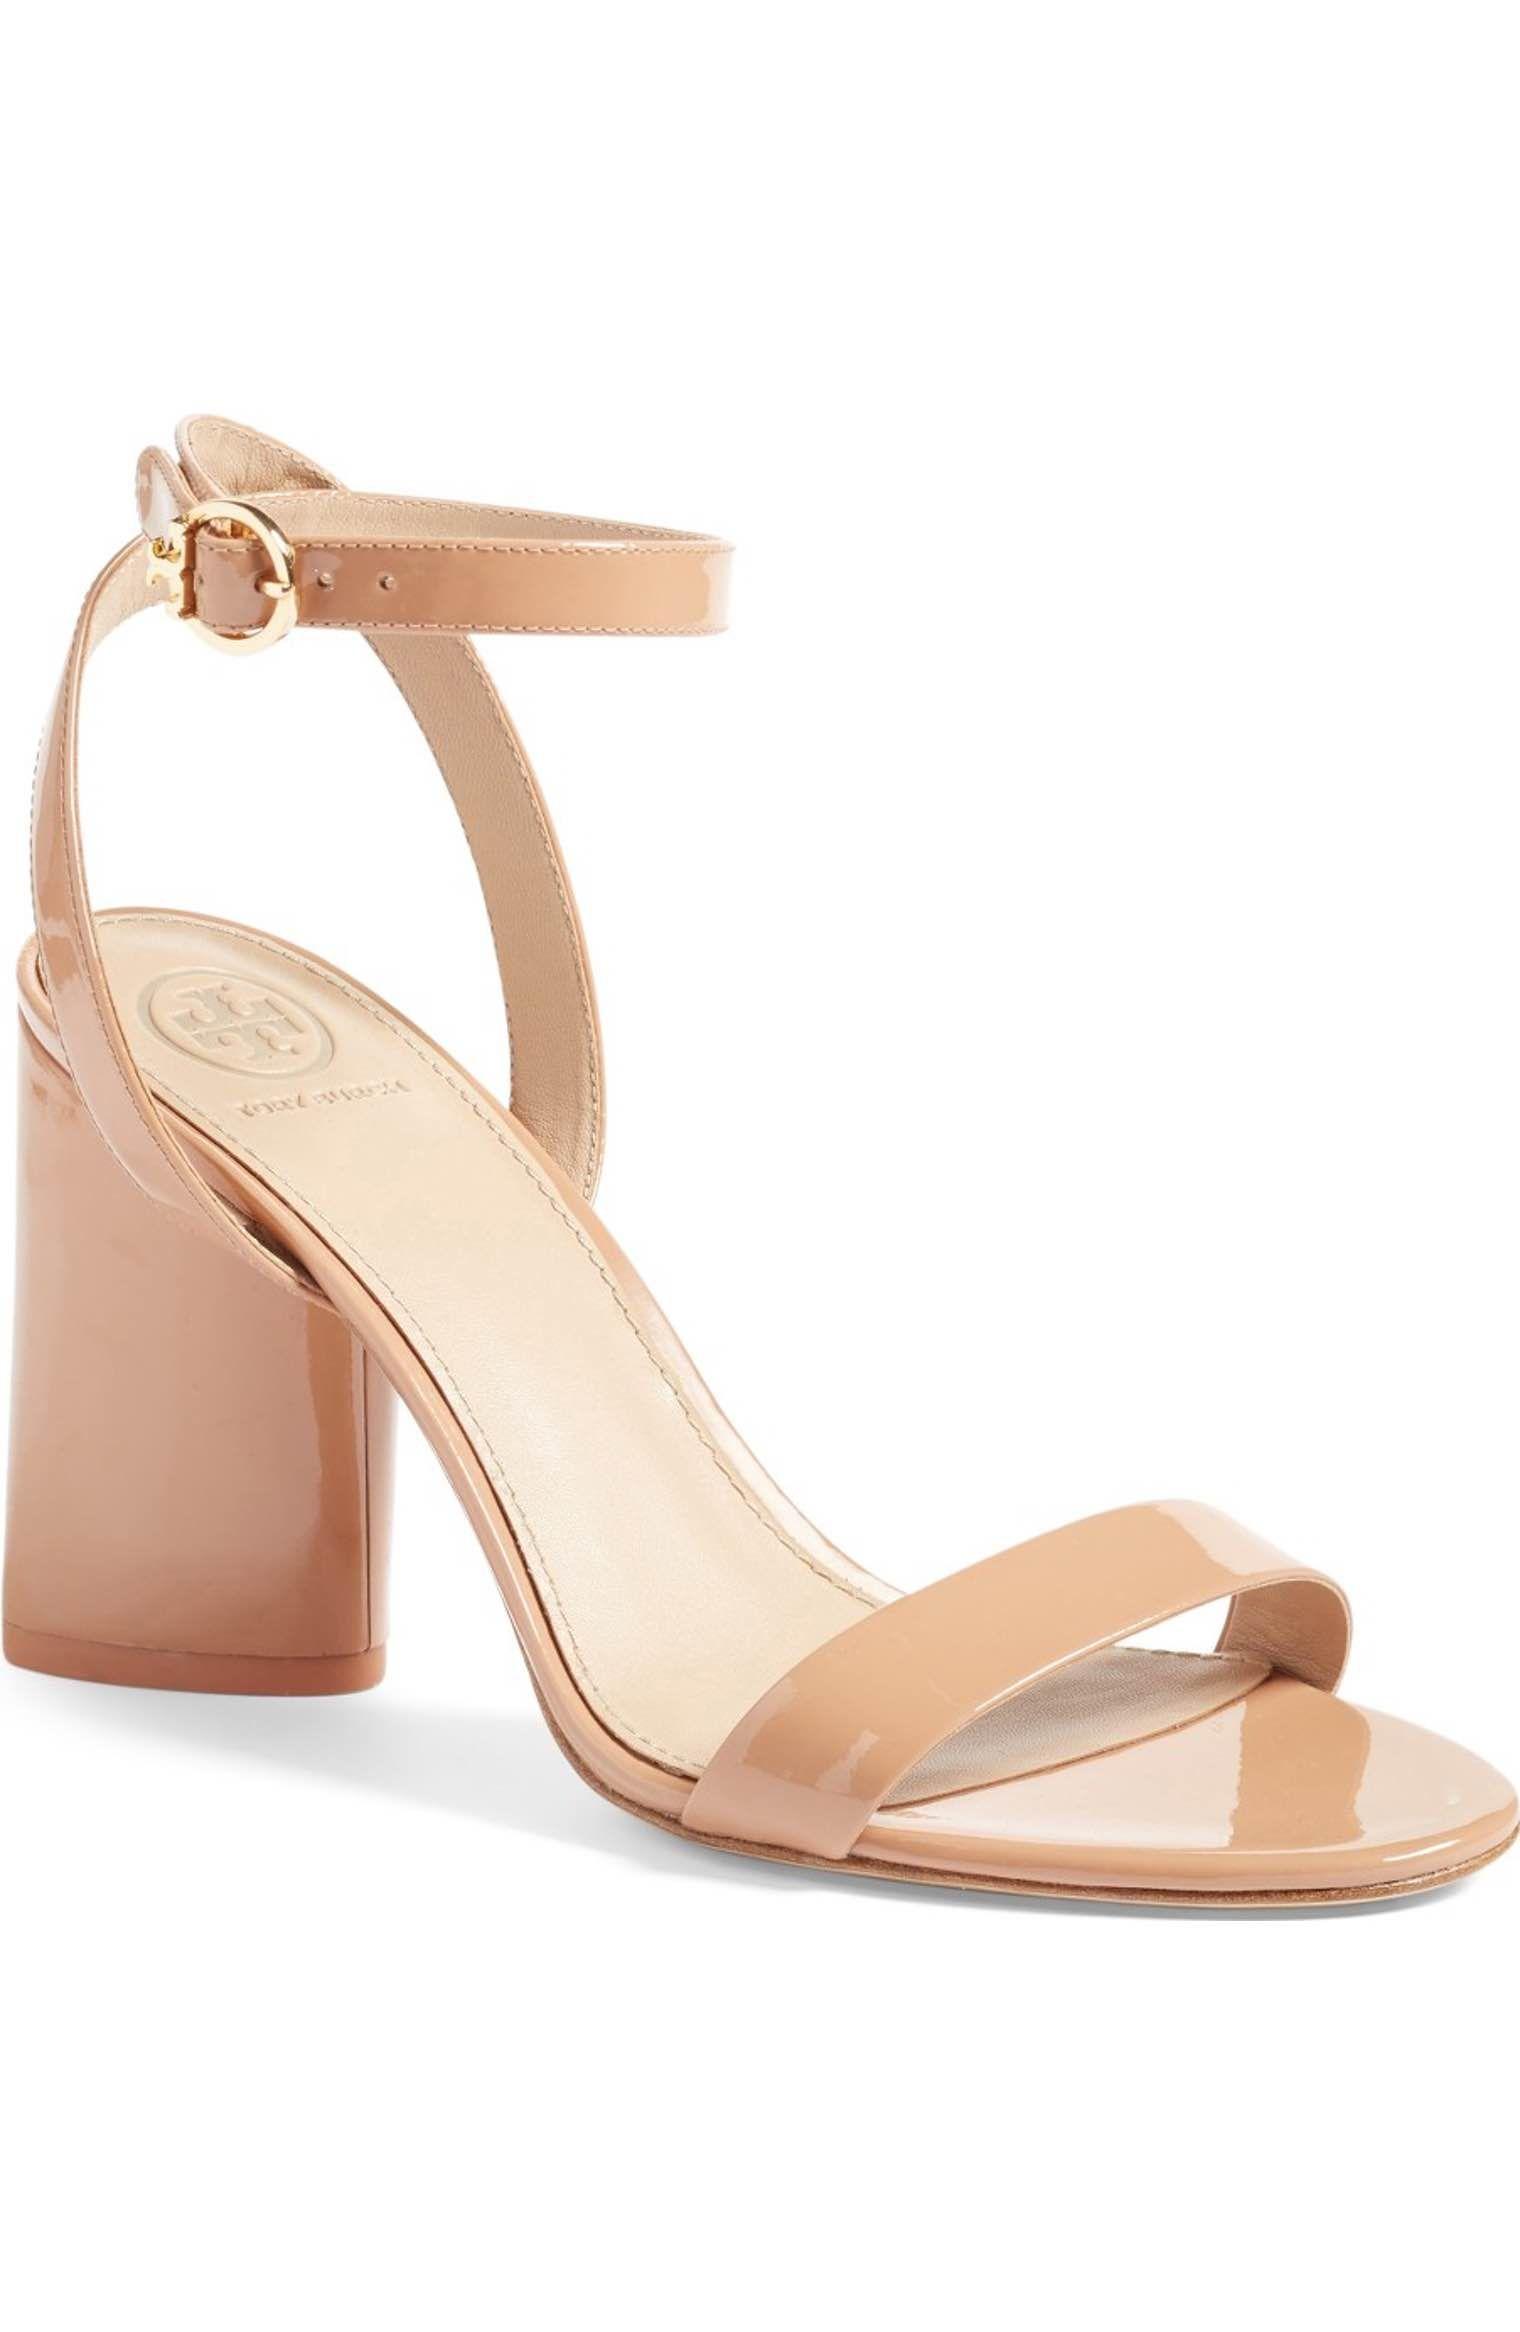 a51cdc7da7fd8 Tory Burch Elizabeth Block Heel Sandal